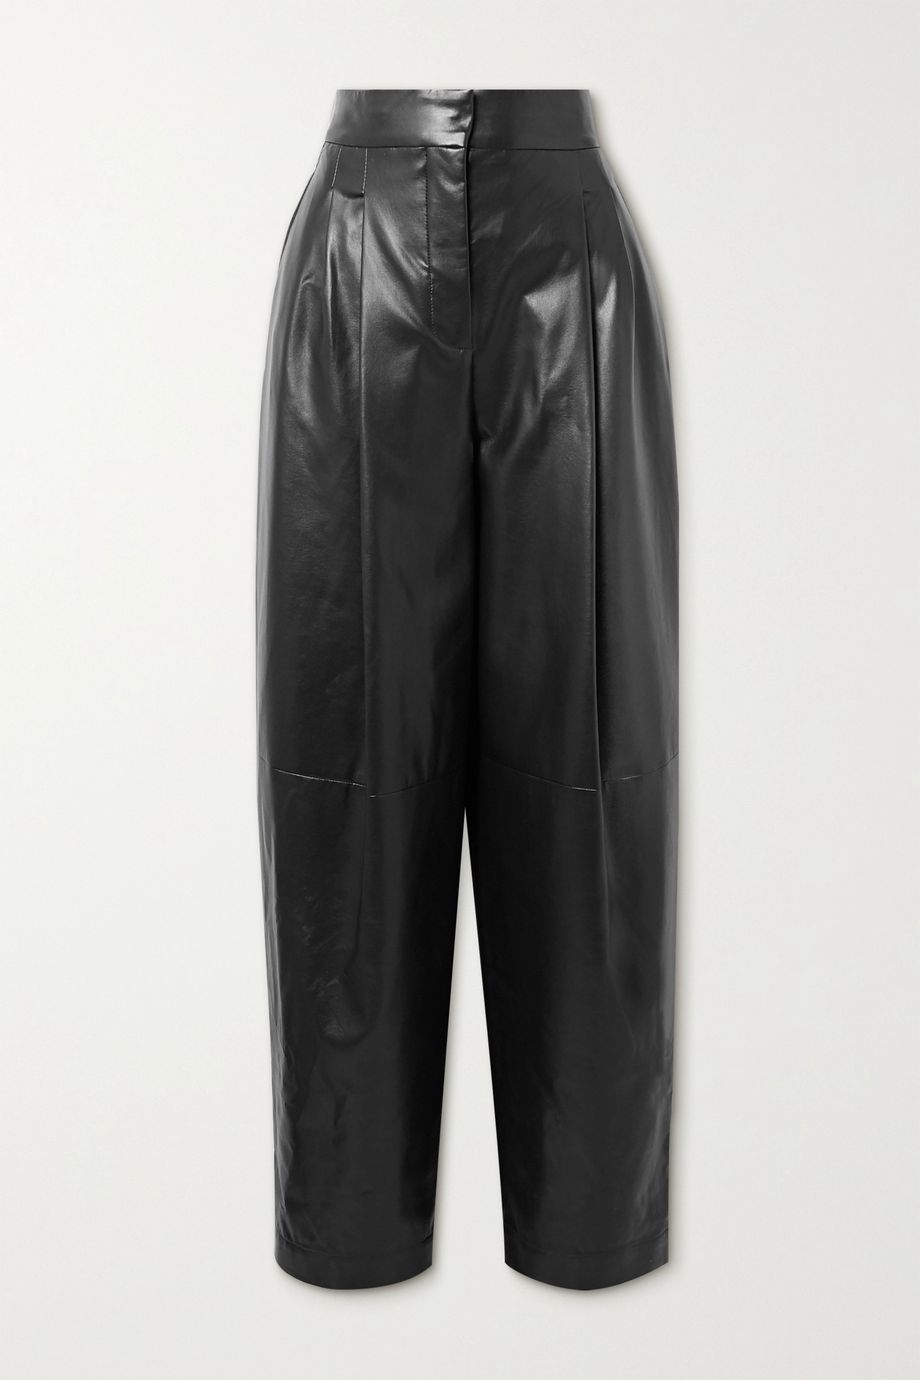 Philosophy di Lorenzo Serafini Faux leather tapered pants